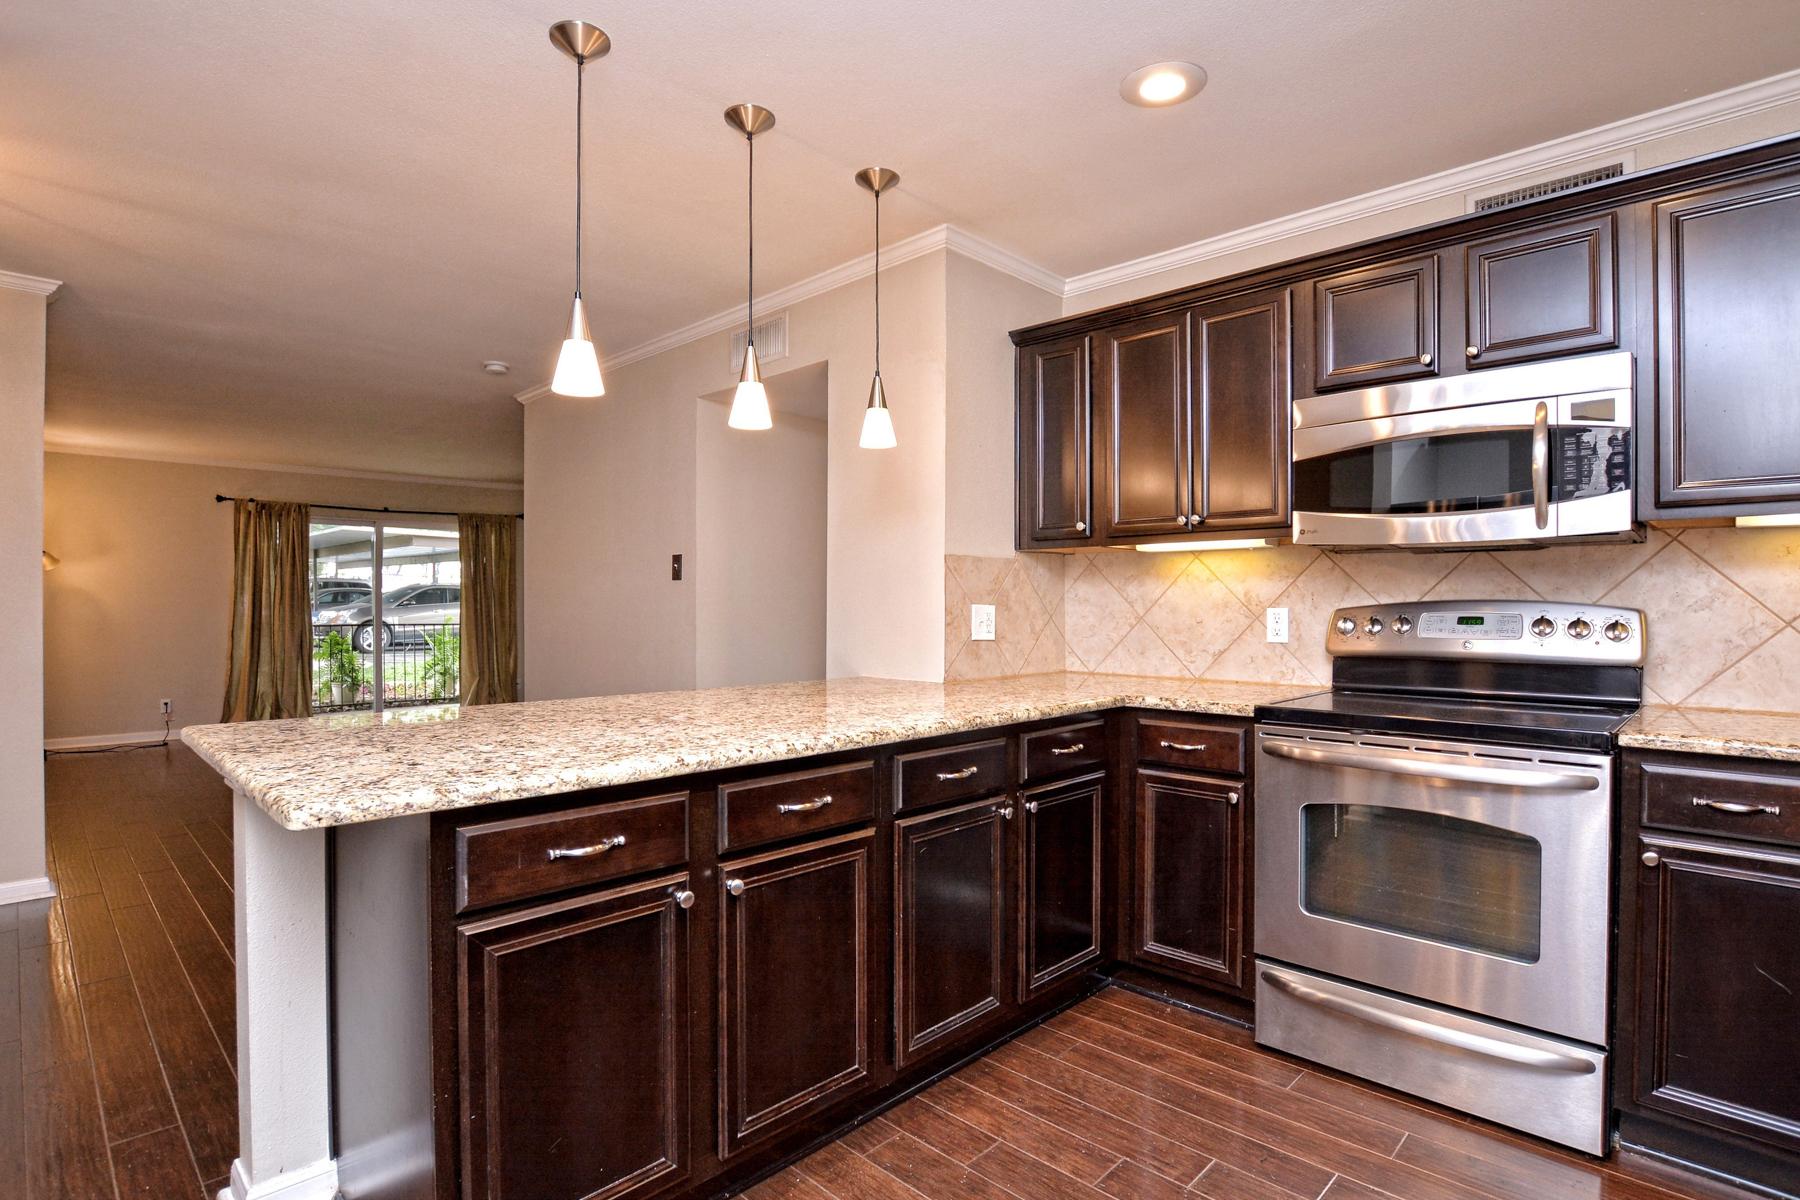 Additional photo for property listing at Fantastic Condo in Villa Dijon 100 Lorenz Rd 301 San Antonio, Texas 78209 United States